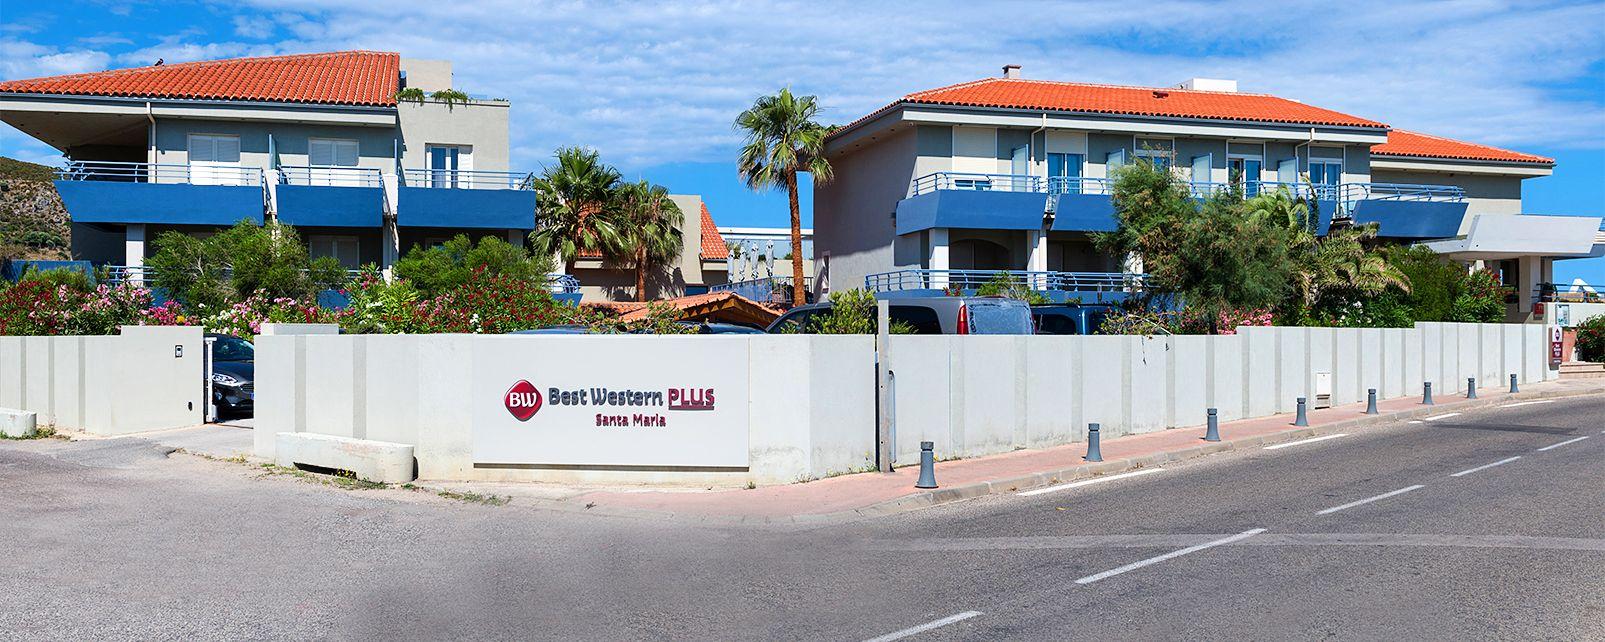 Hotel Best Western Santa Maria